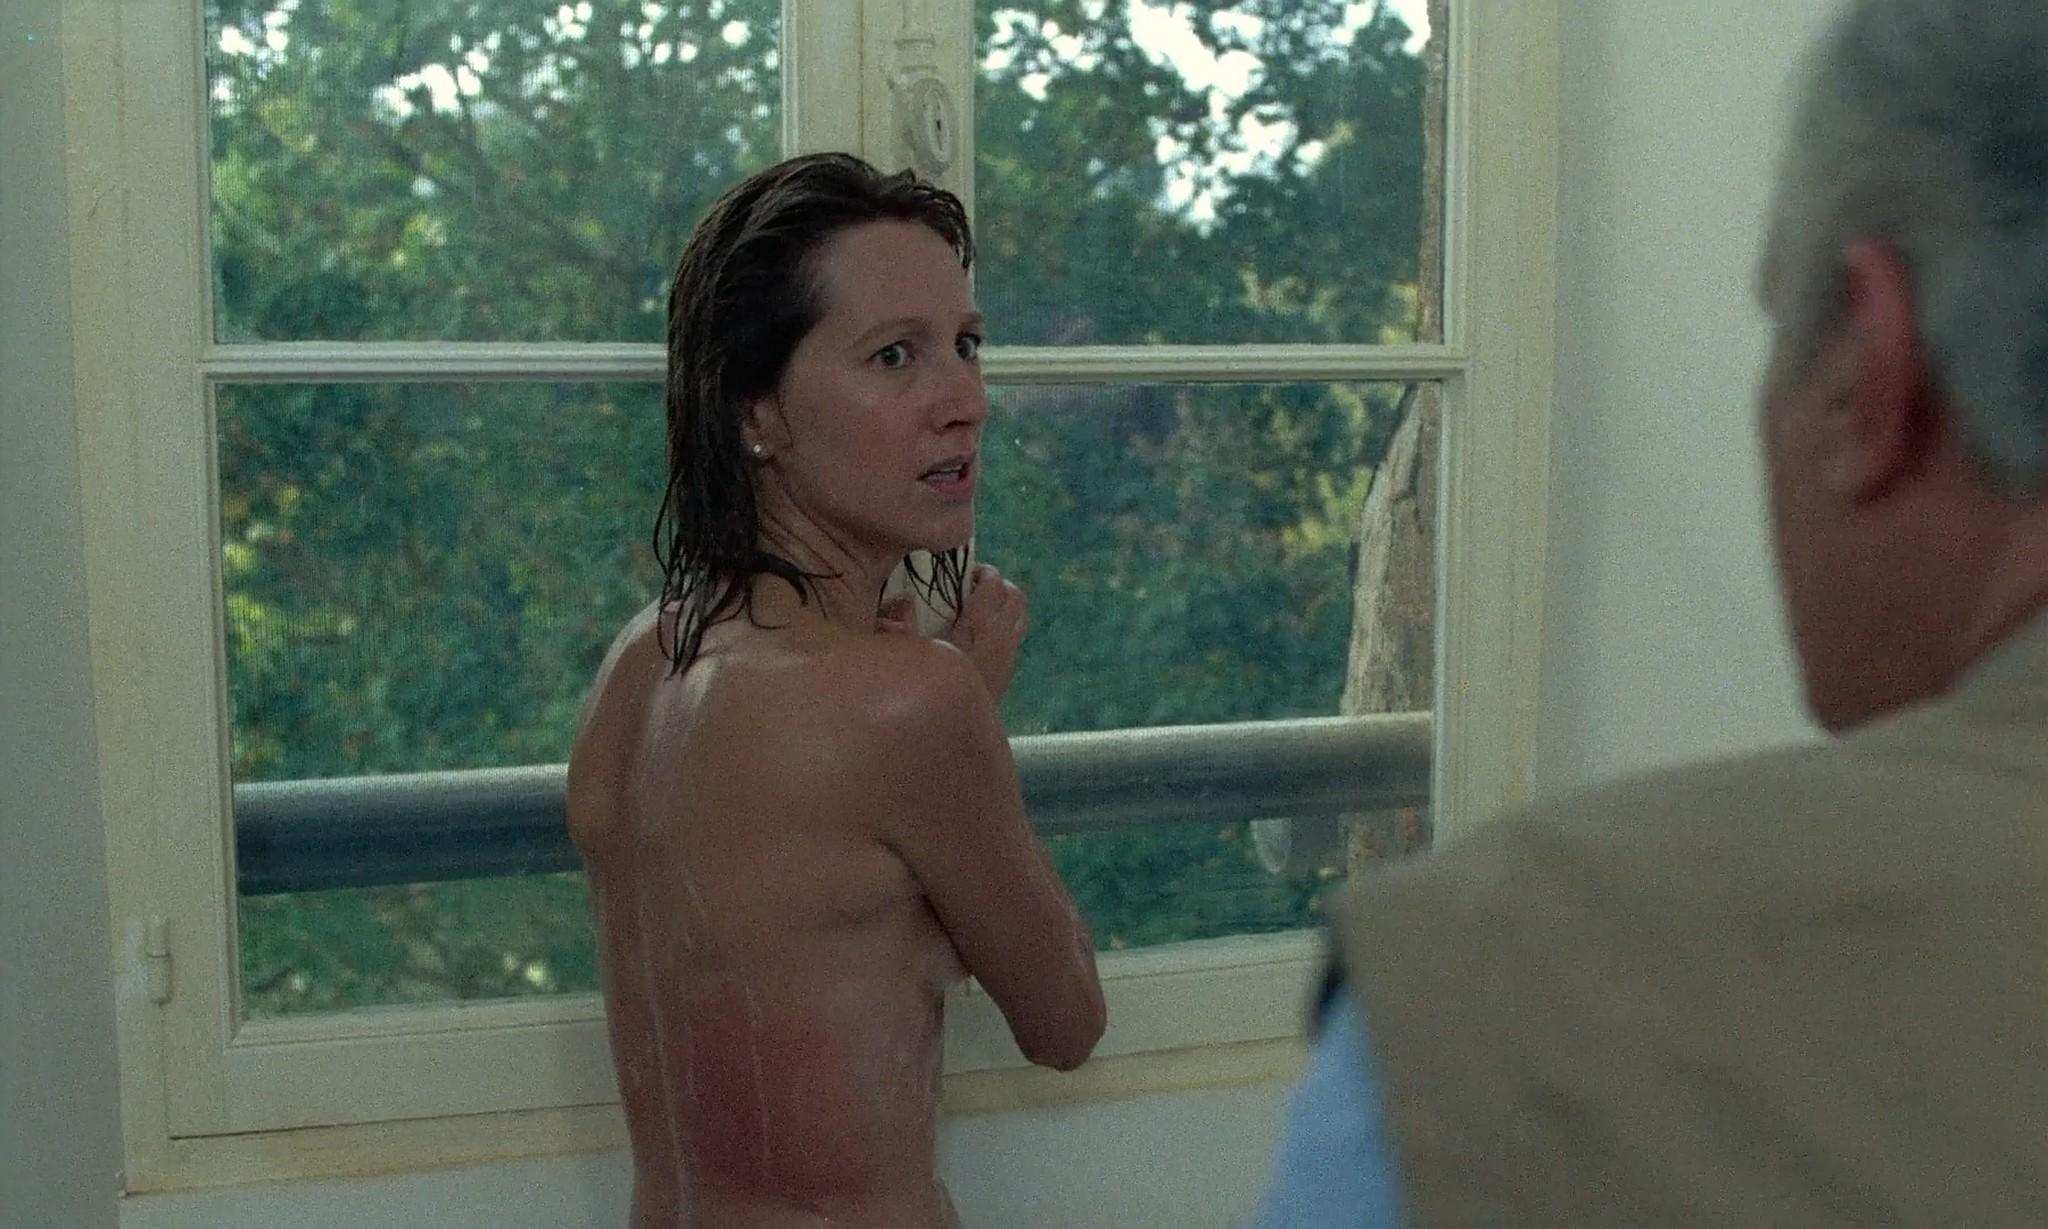 Nathalie Baye nude in the shower En toute innocence FR 1988 1080p BluRay 14